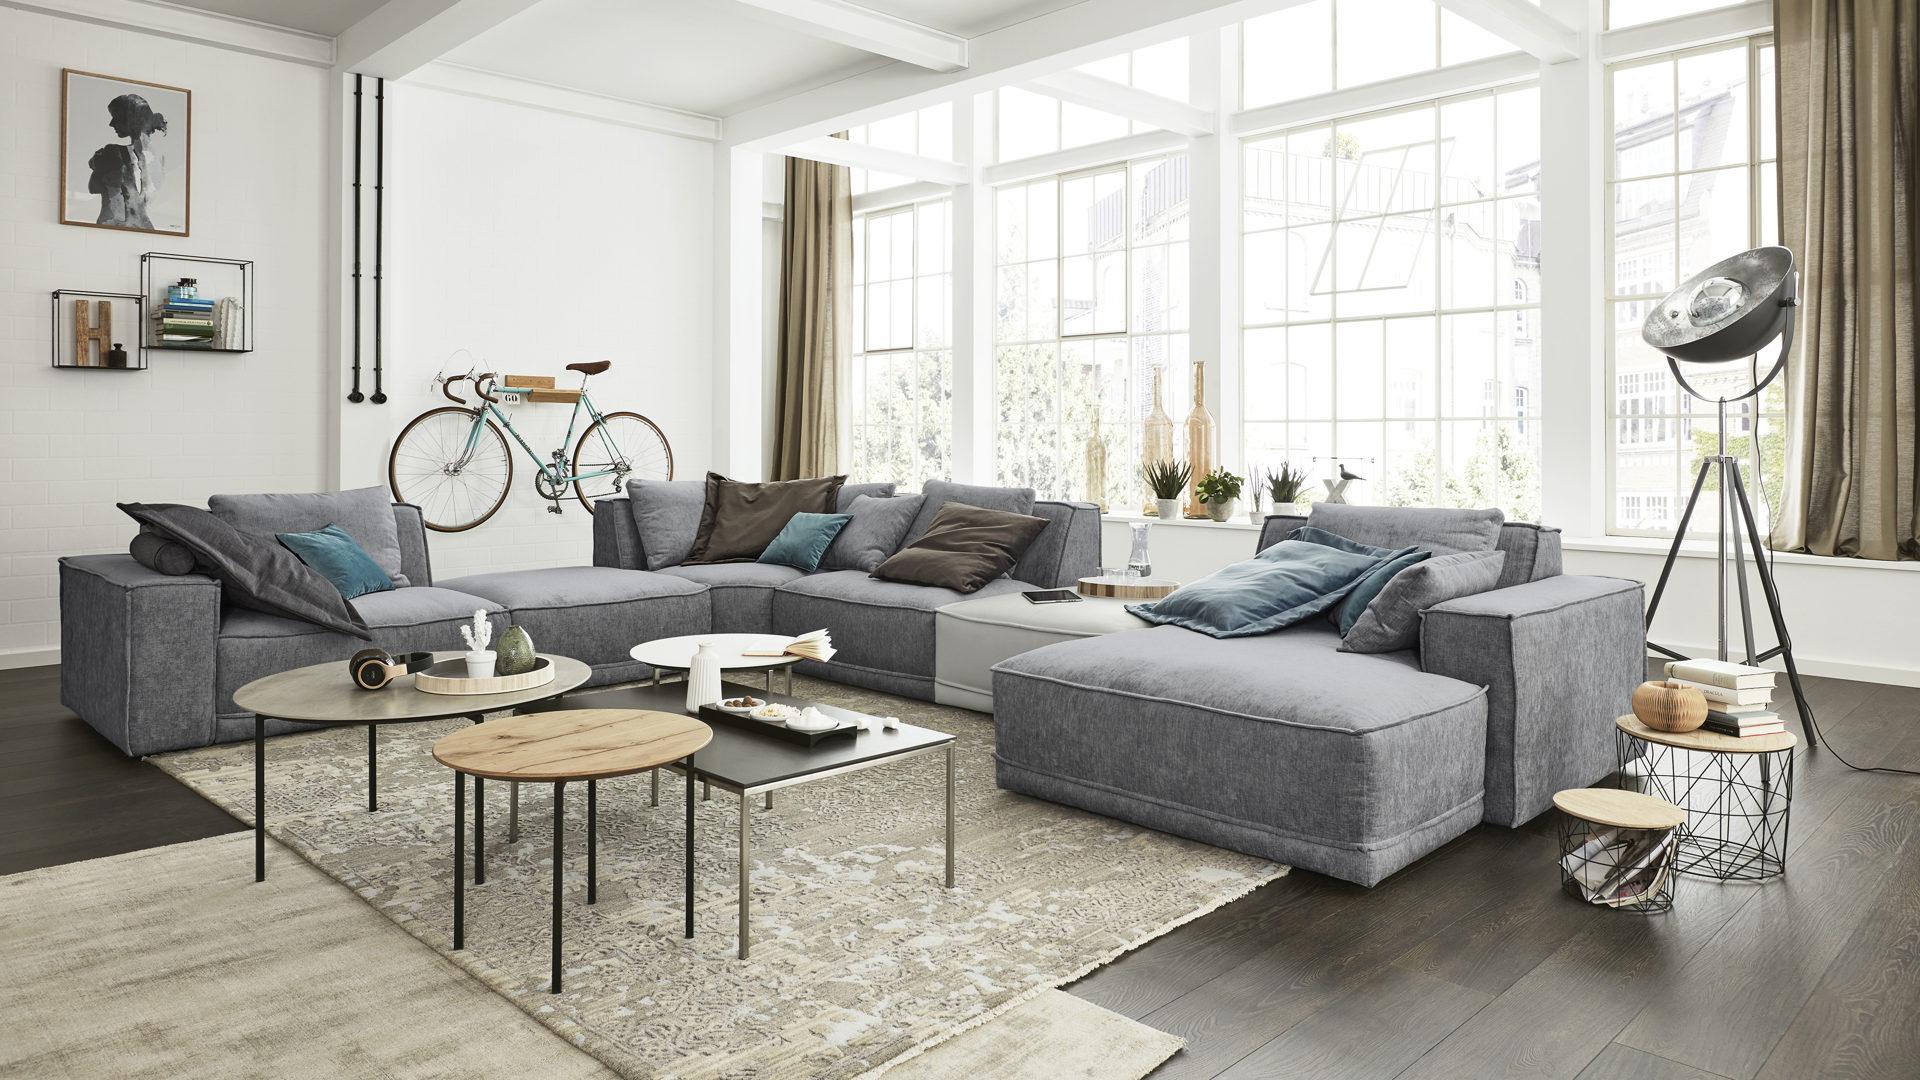 Interliving Sofa Serie 4100 Wohnlandschaft Jeansfarbener Stoffbezug